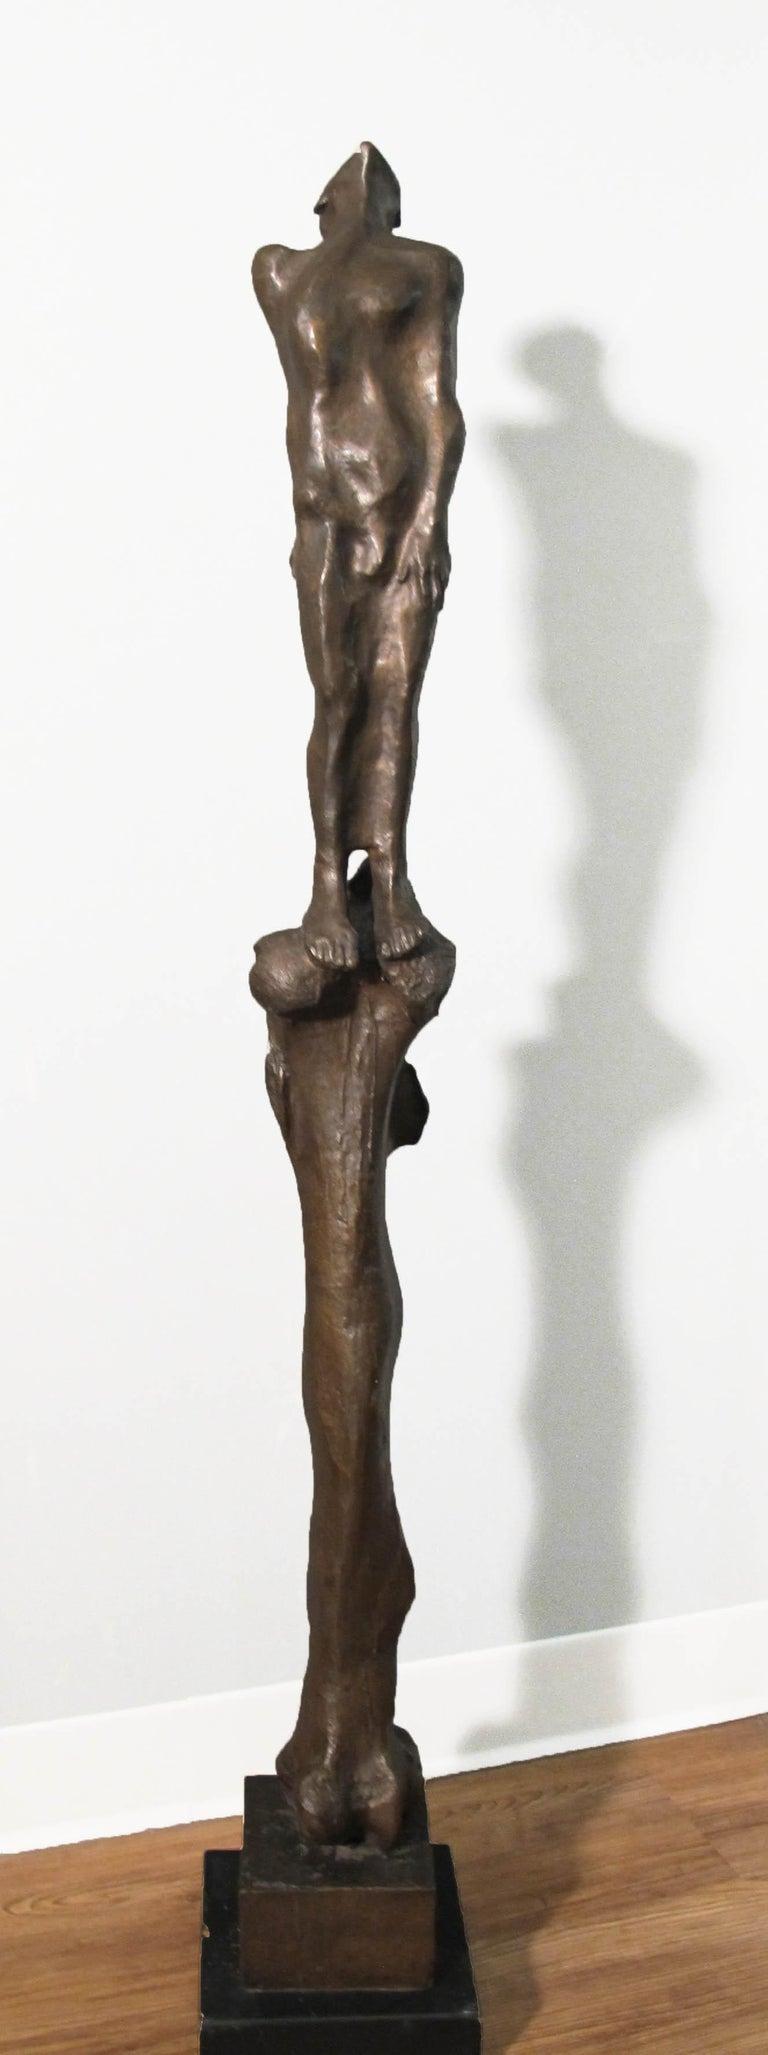 Michael Ayrton Figurative Sculpture - Stylite